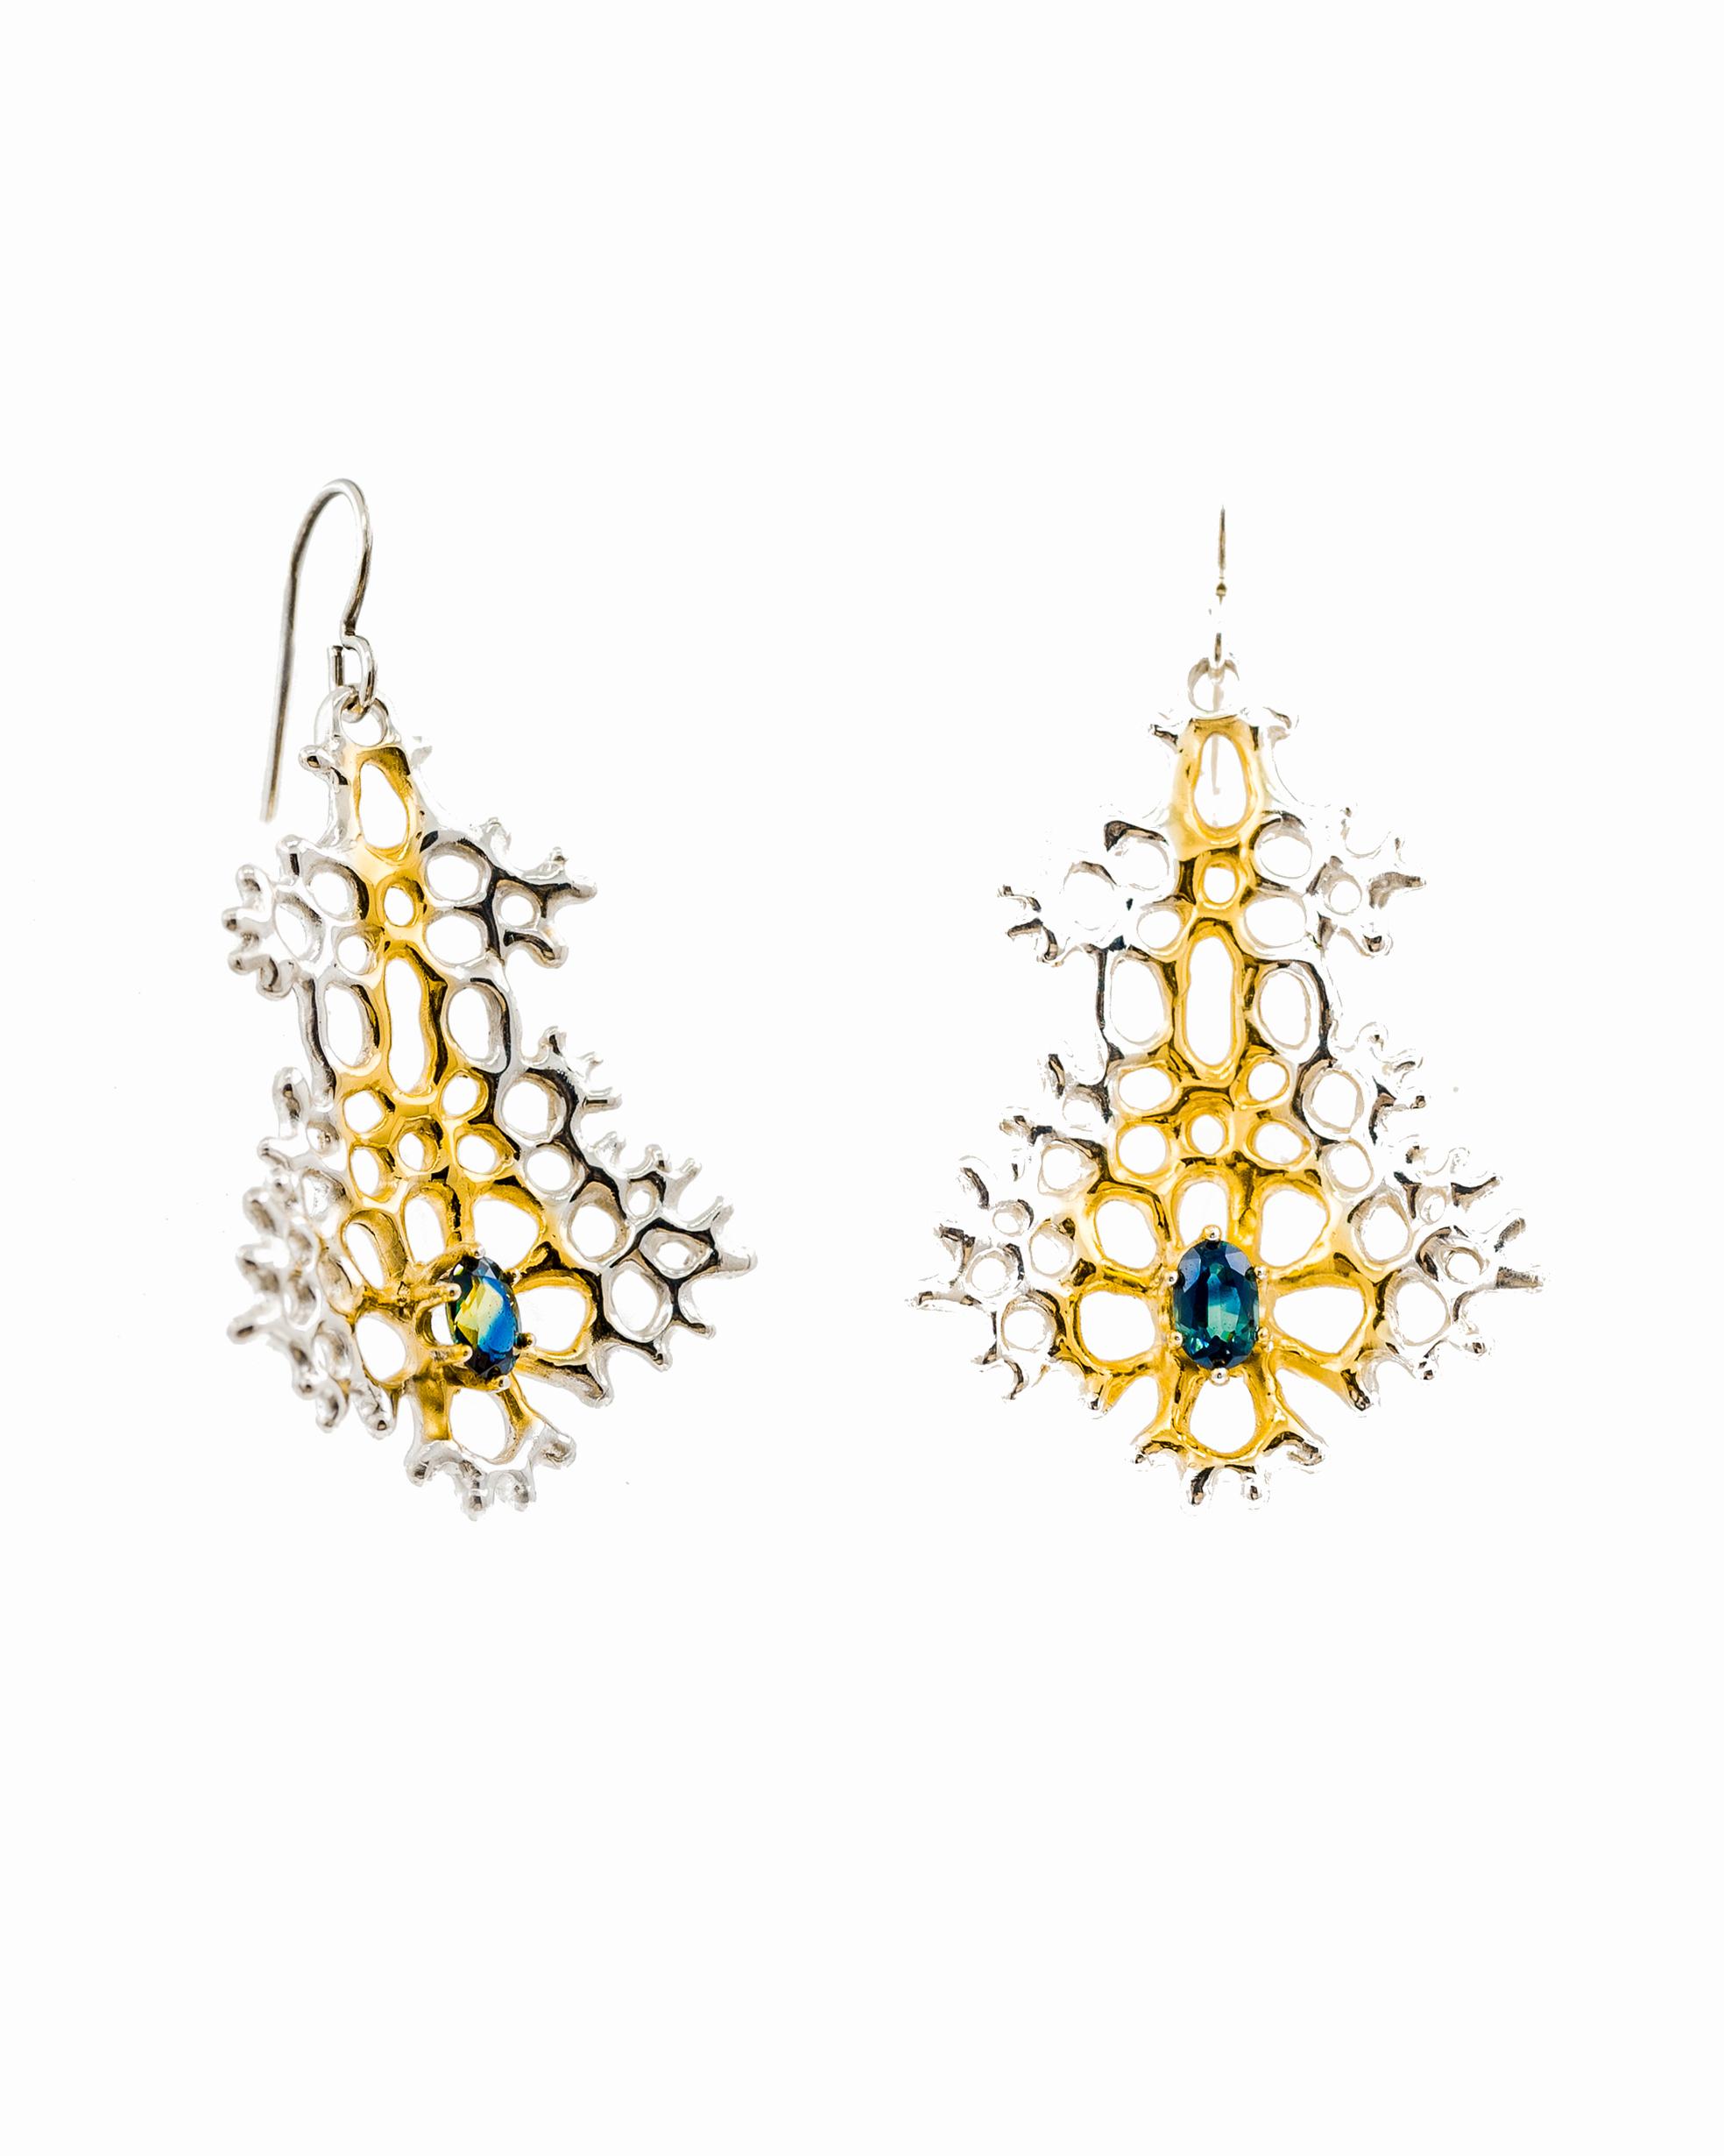 Large Radial Earrings: Sterling silver, gold vermeil, Australian blue sapphire